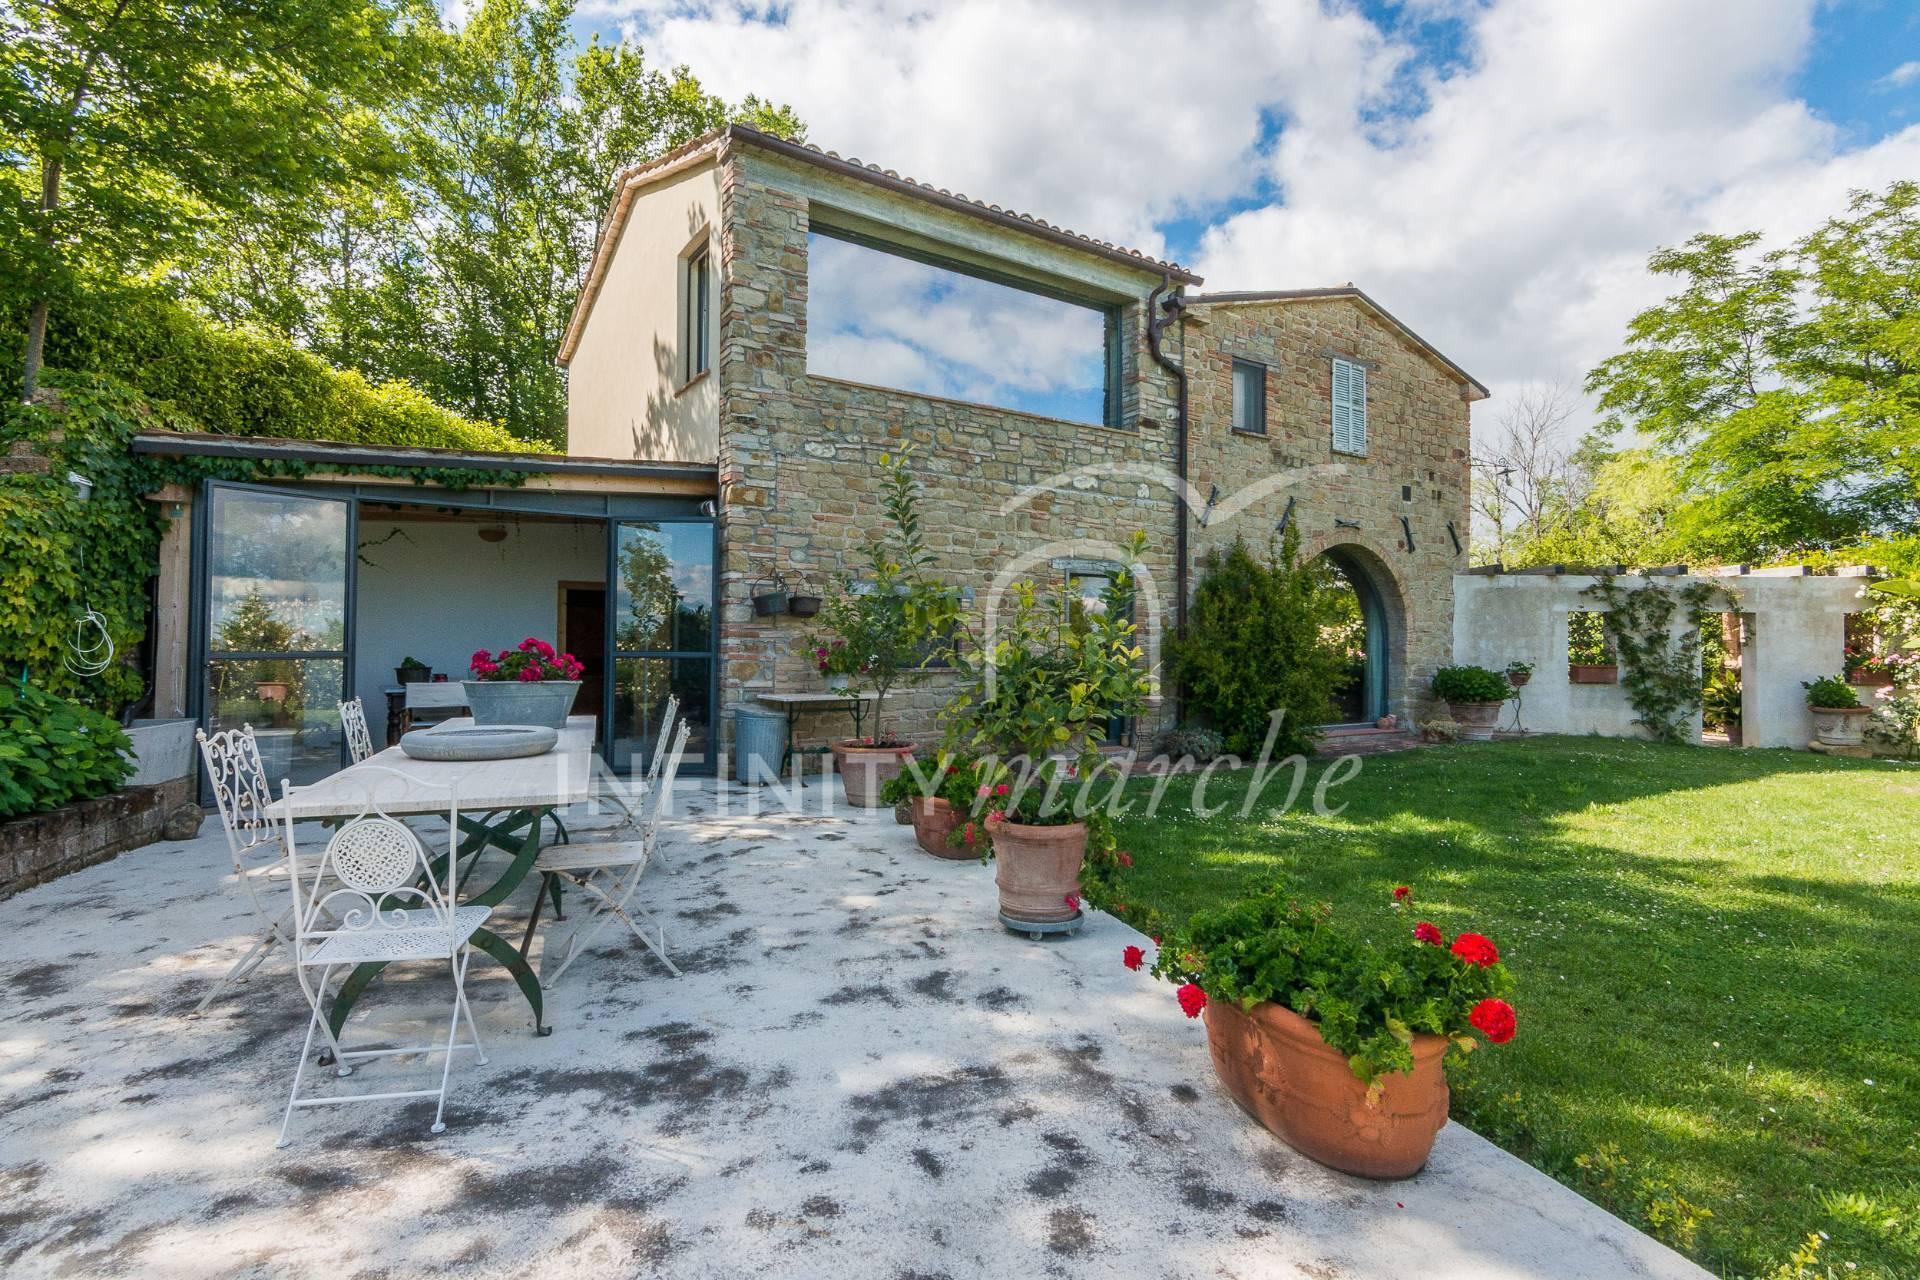 Casale a San Ginesio (Macerata)